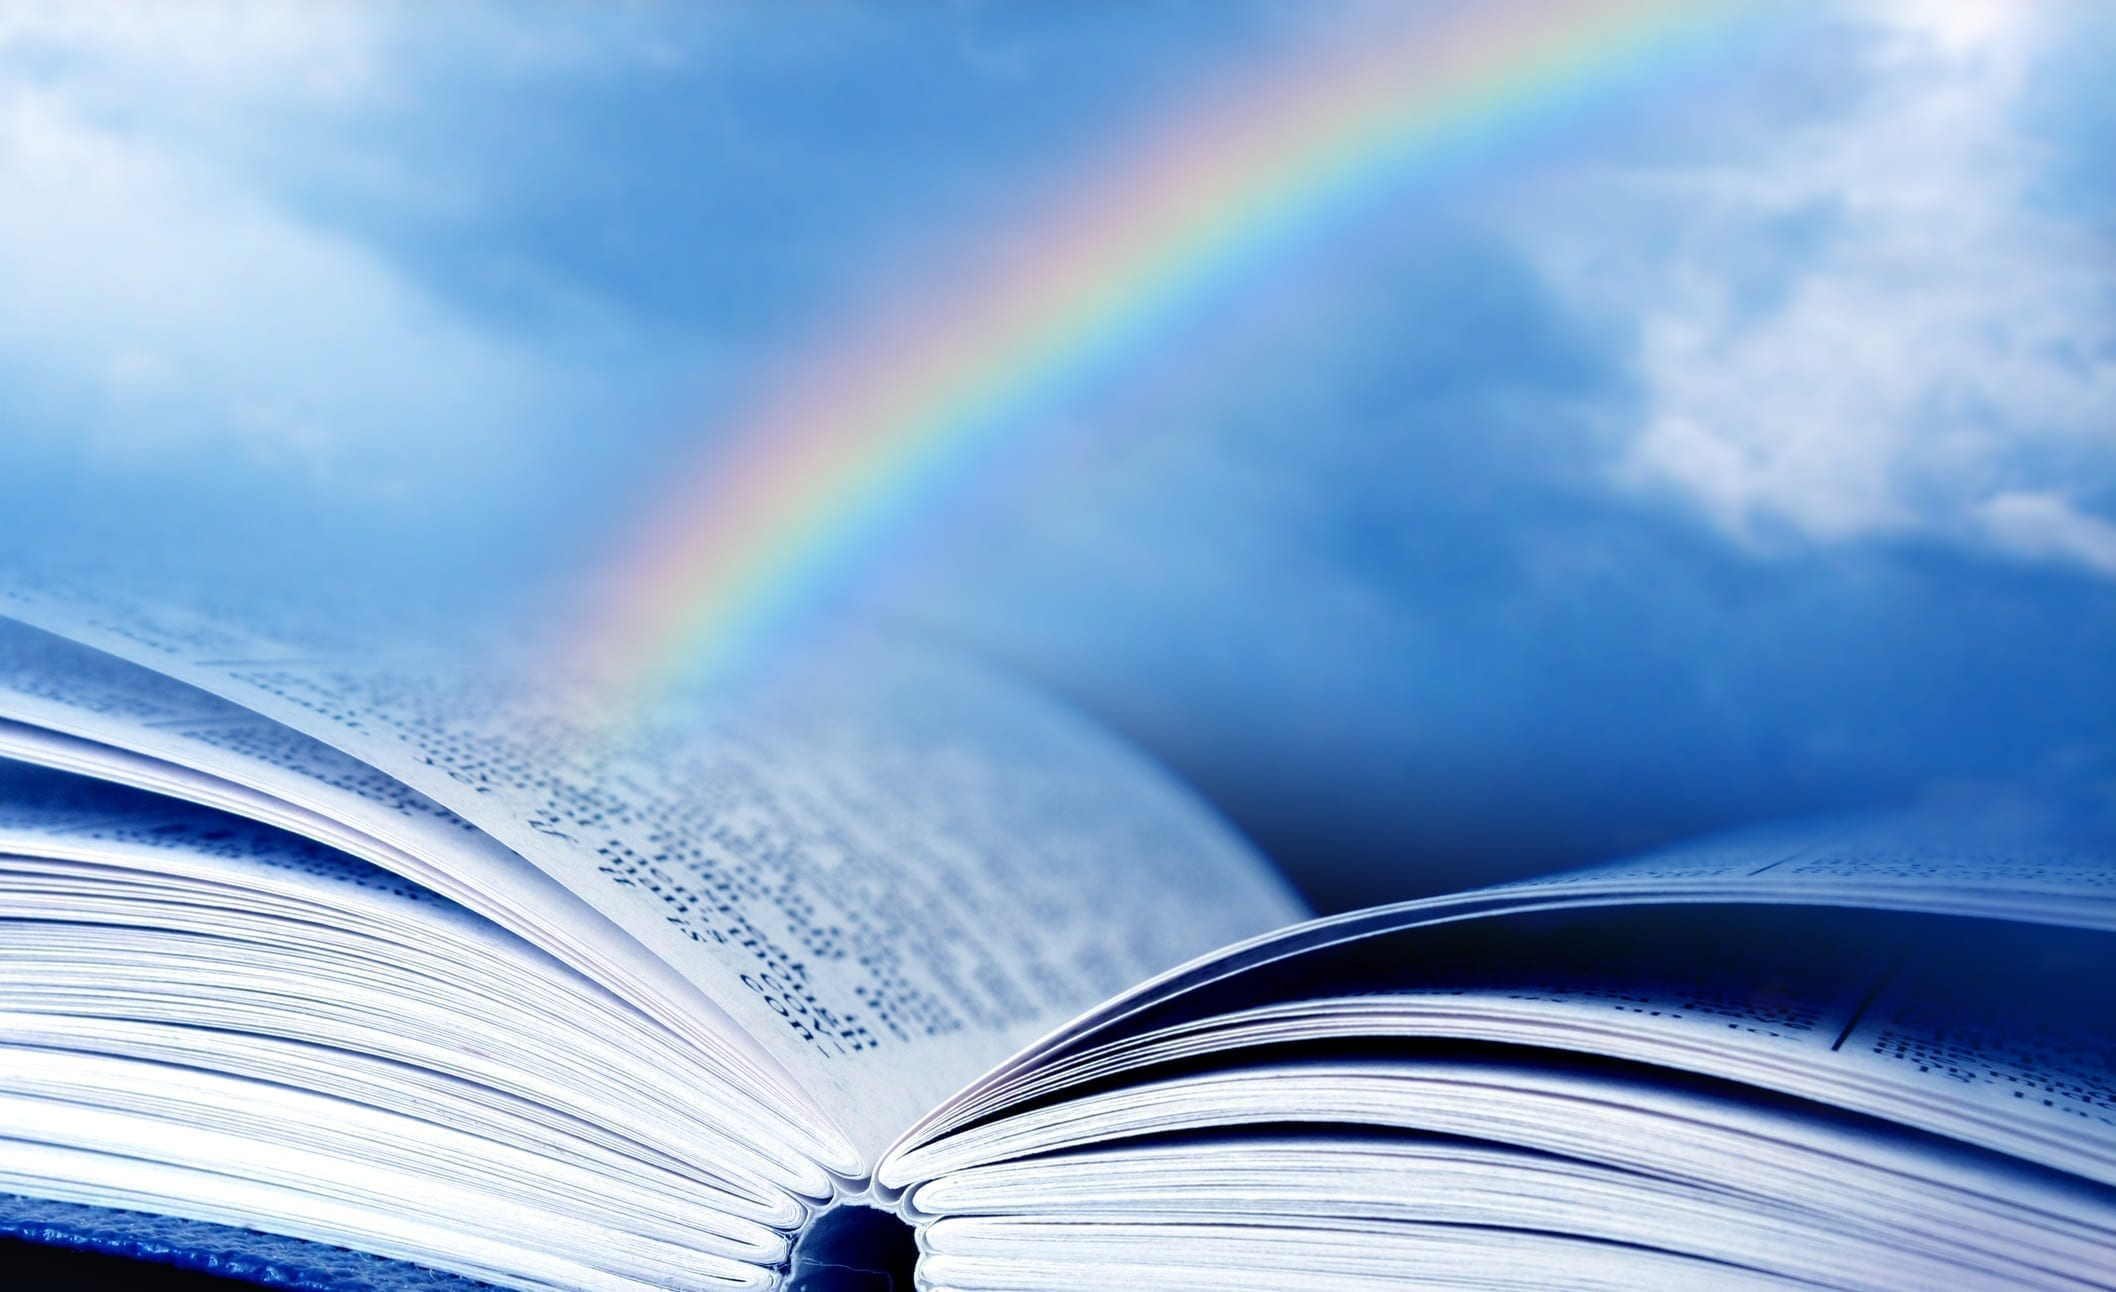 Rainbow about a Bible: ID 15028345 © Annie Su Yee Yek | Dreamstime.com